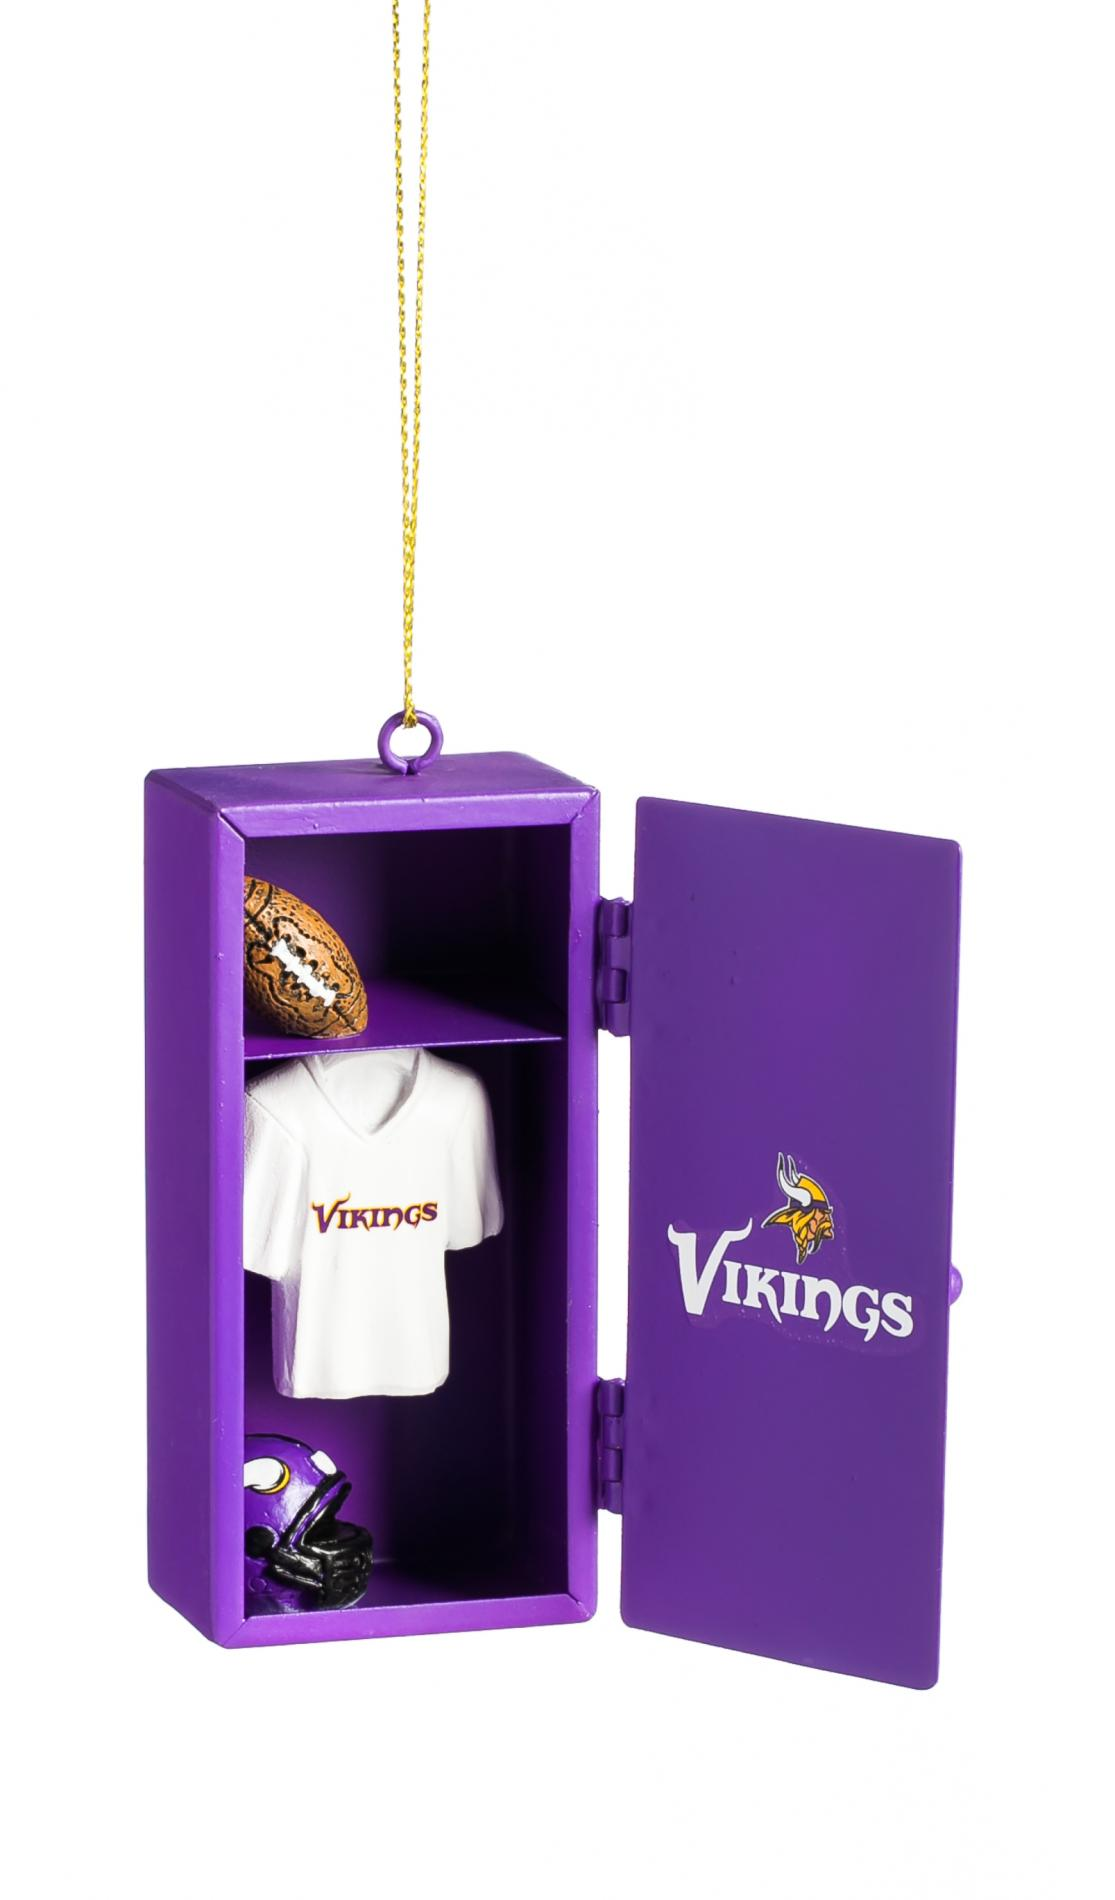 NFL Team Locker Christmas Ornament - Minnesota Vikings PartNumber: 046W009026120001P KsnValue: 9026120 MfgPartNumber: ZS3OT3817LK